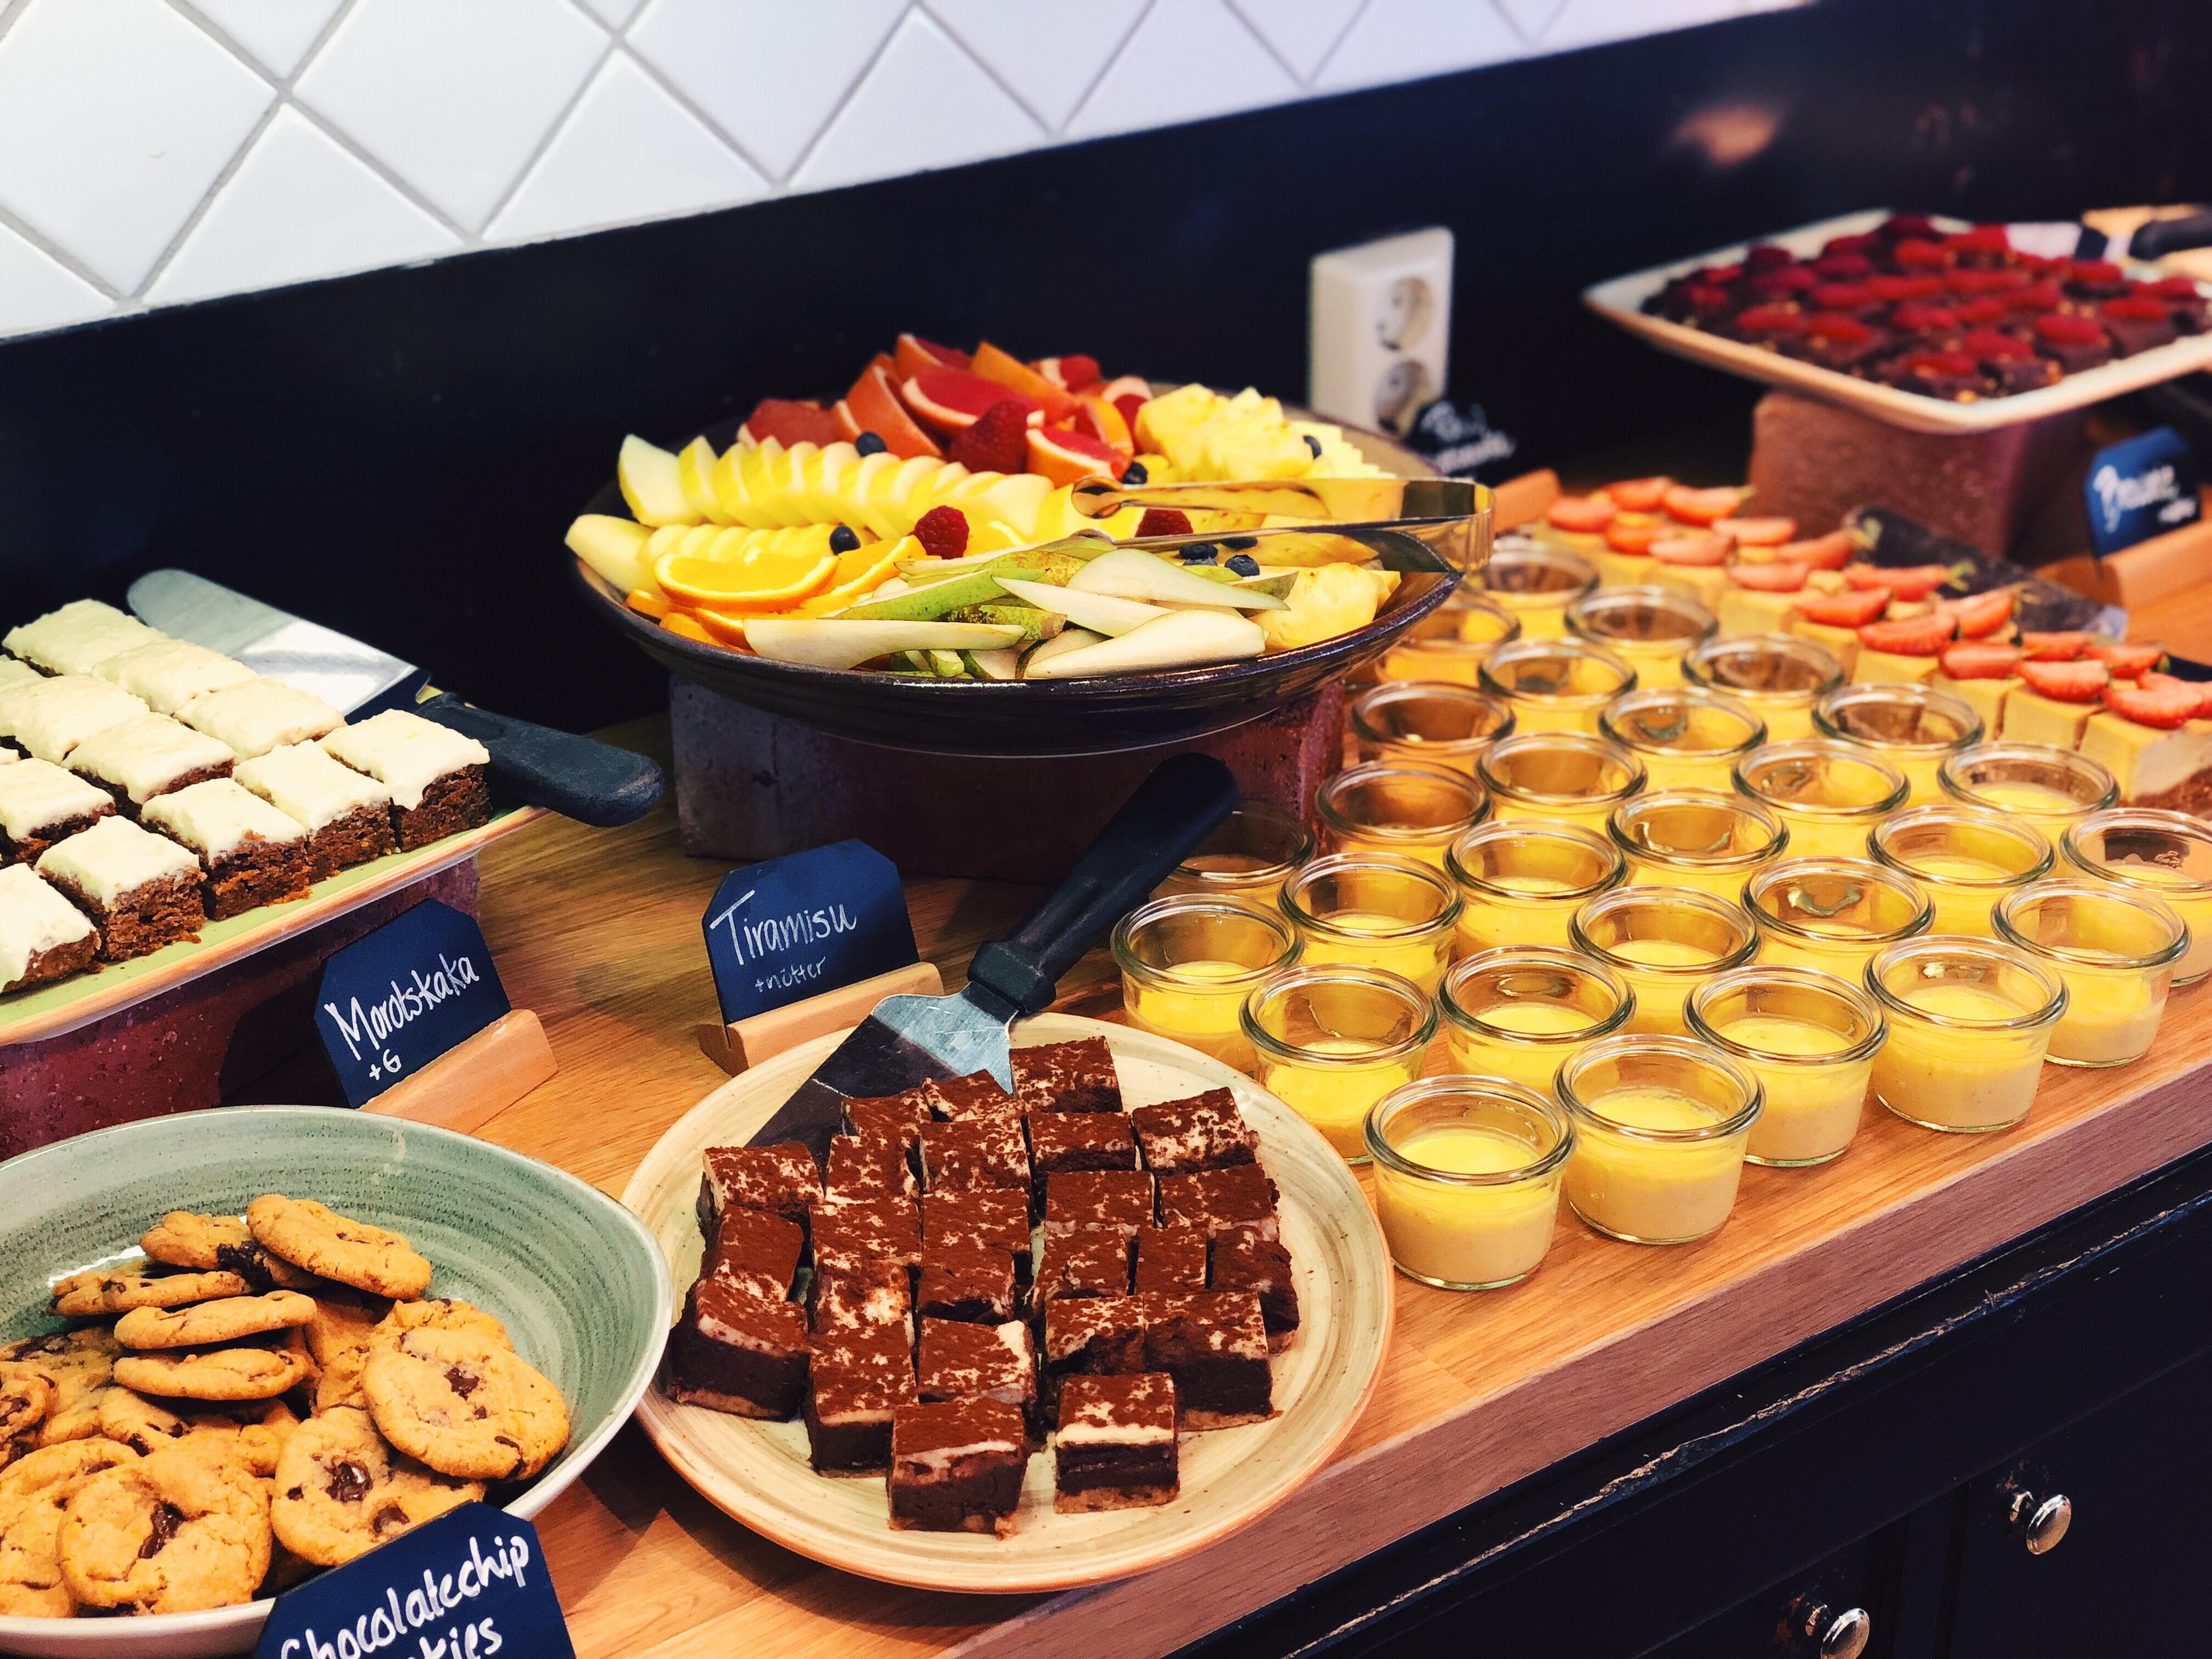 vegansk brunch buffe vegan stockholm restaurang Radisson hagaparken